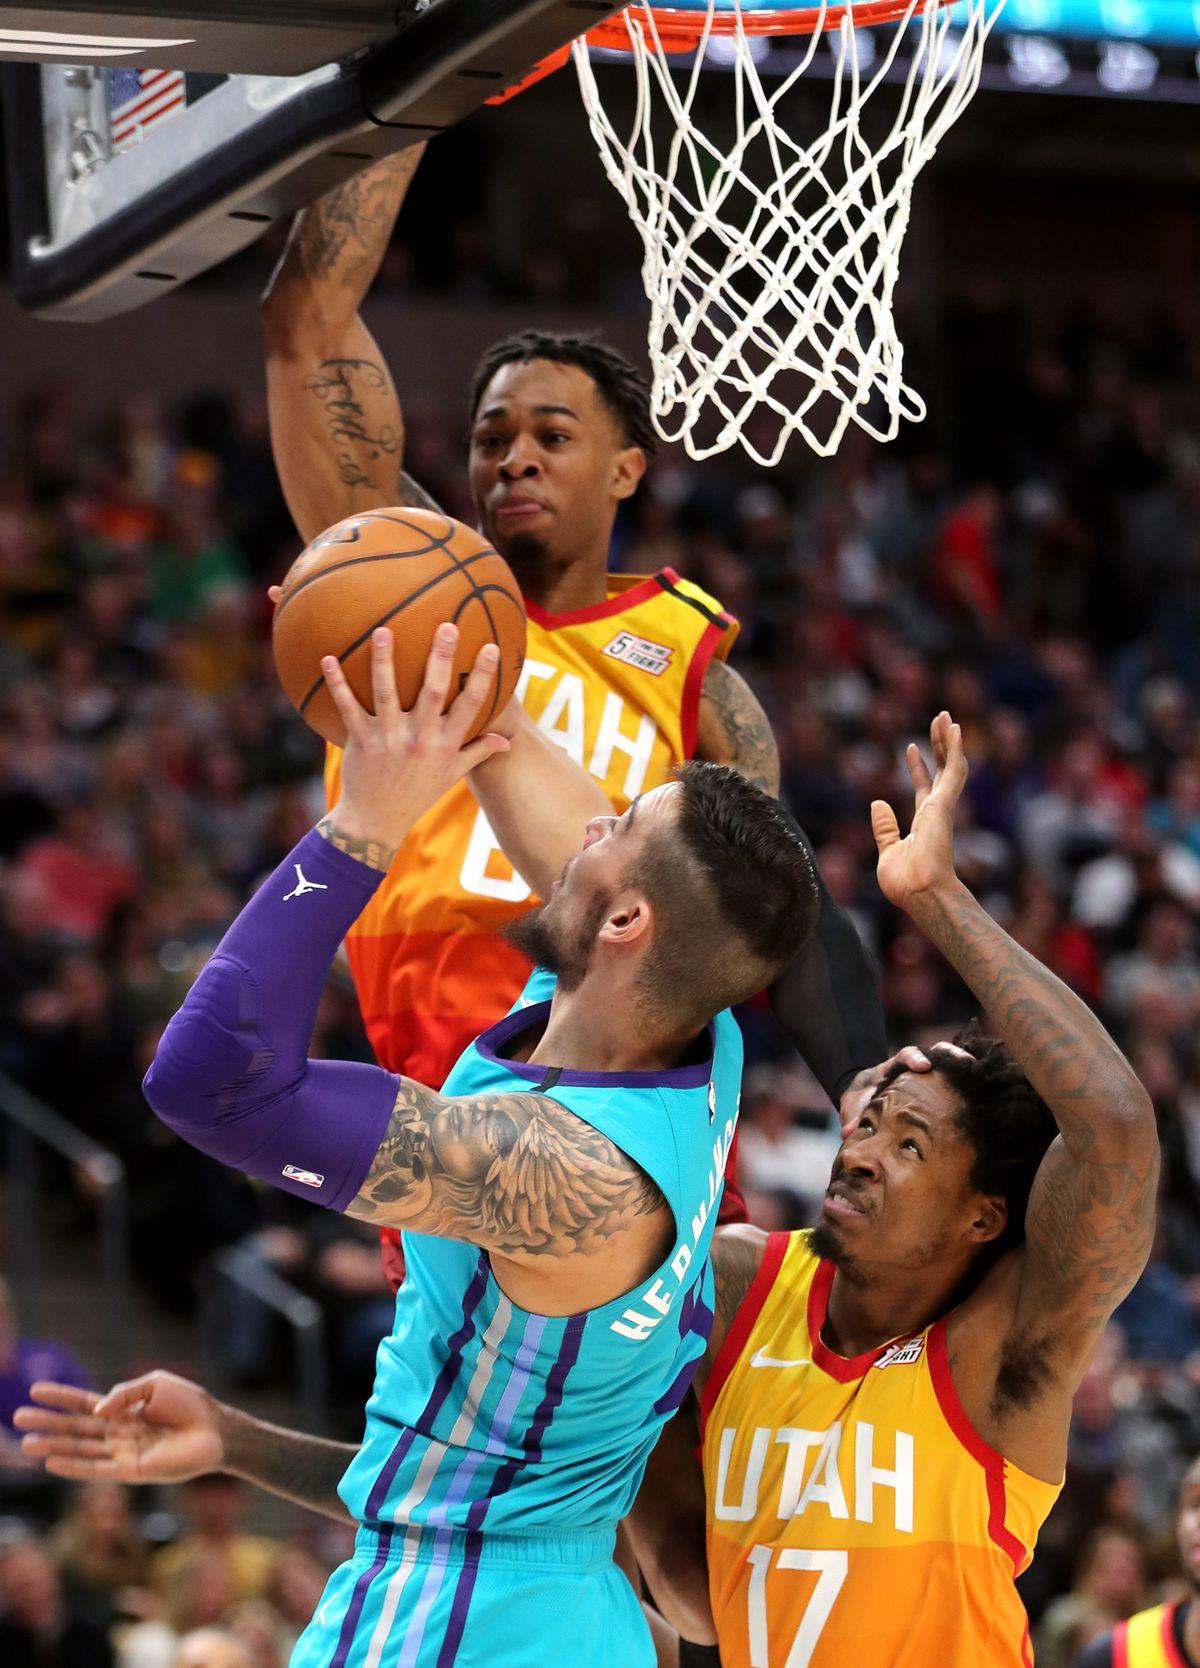 Utah Jazz guard Rayjon Tucker (6) and Utah Jazz center Ed Davis (17) work to defend Charlotte Hornets center Willy Hernangomez (9) as the Utah Jazz and the Charlotte Hornets play an NBA basketball game at Vivint Arena in Salt Lake City on Friday, Jan. 10, 2020. Utah won 109-92.